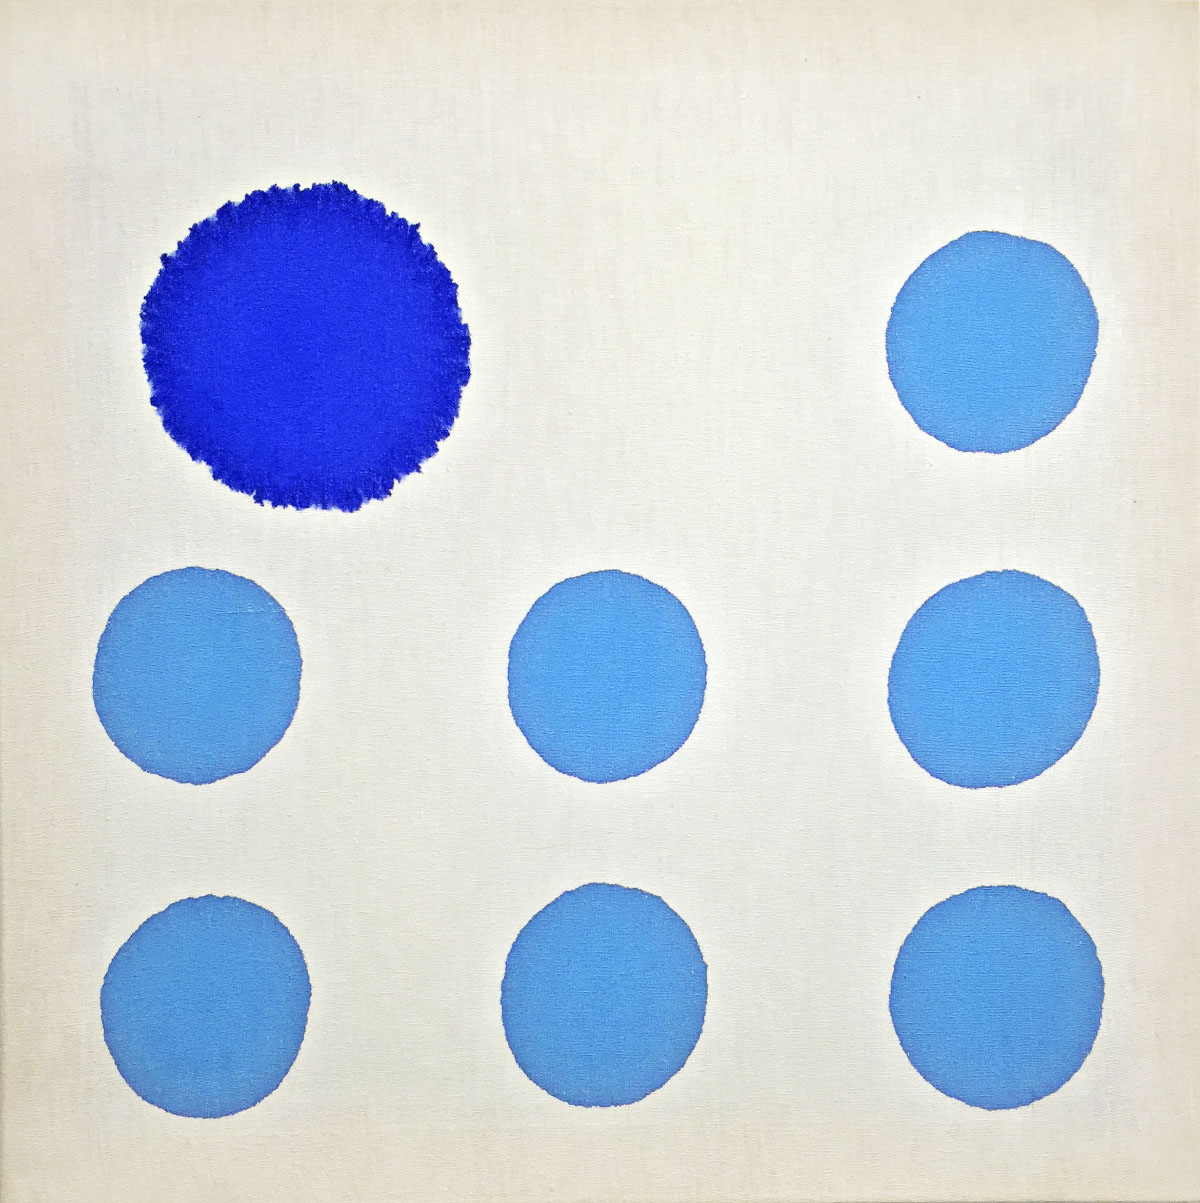 Canvas Injections C, 1980, Blu Ultramarine,cmc 3.5/cmc 0.5 x 7,47 x 47 cm